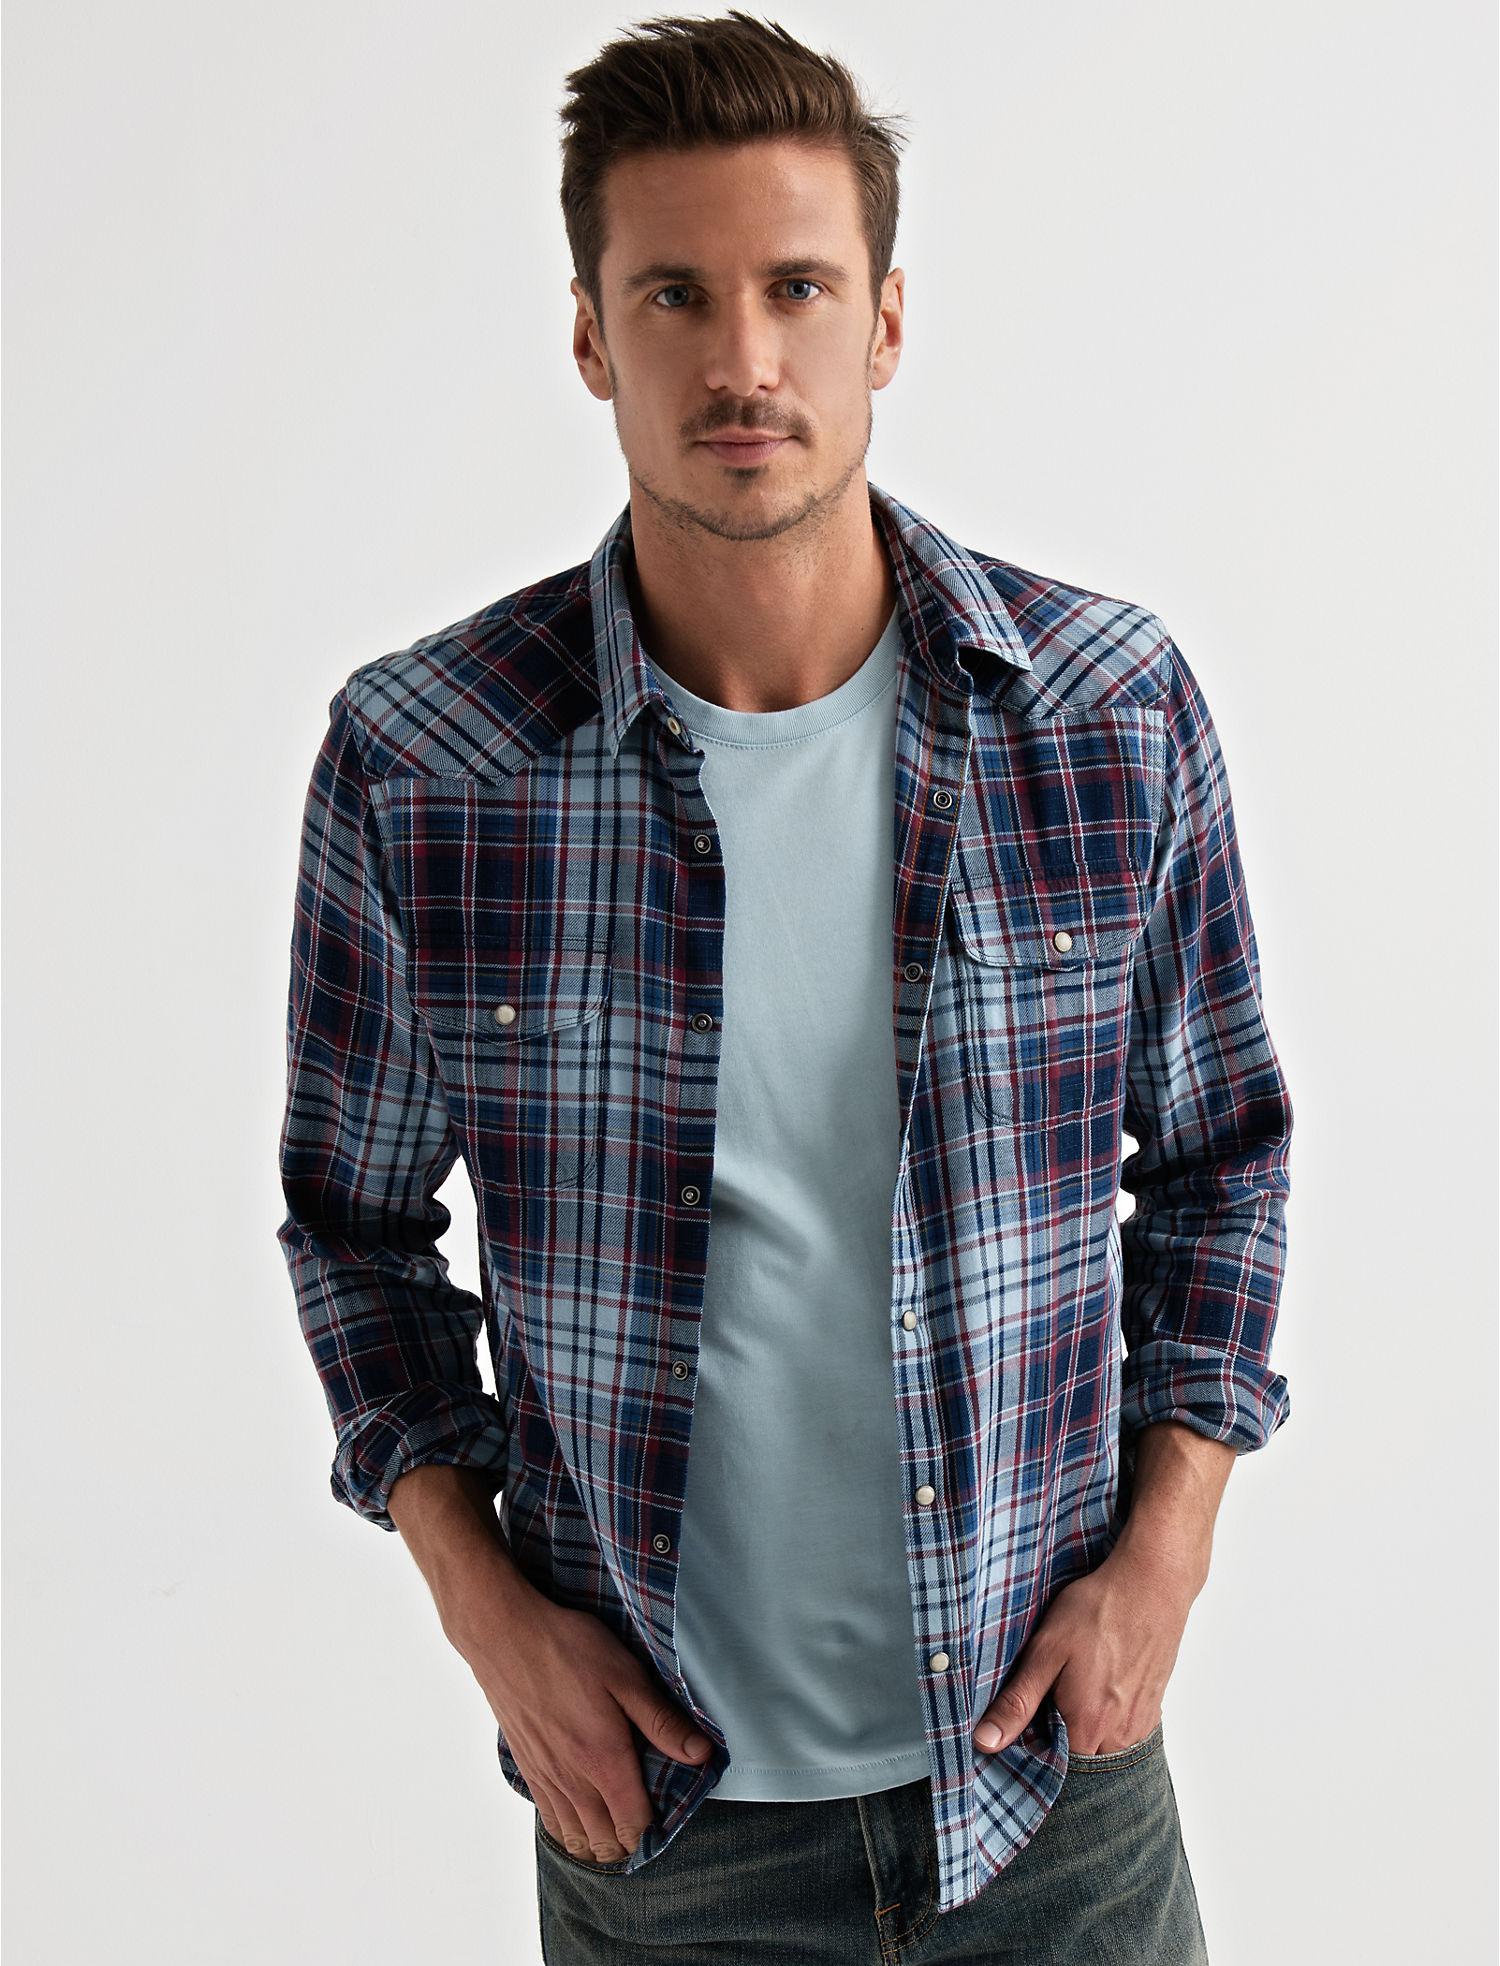 571da8b0f5 Long Sleeve SANTA FE WESTERN Shirt